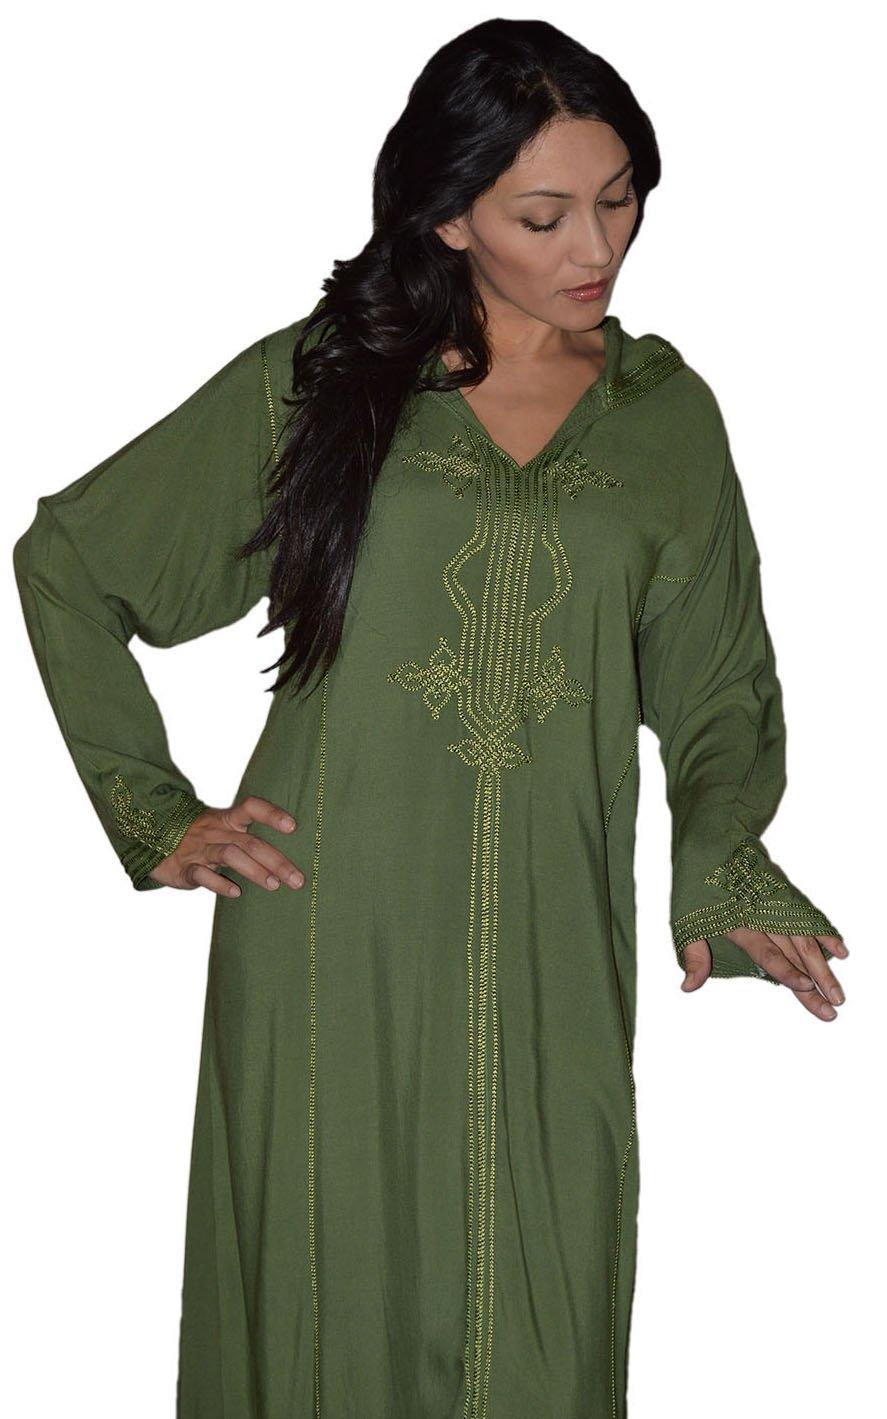 b7c8f82afa372e Amazon.com  Moroccan Caftans Women Hand Made Djellaba Embroidered Size  Extra Large Green